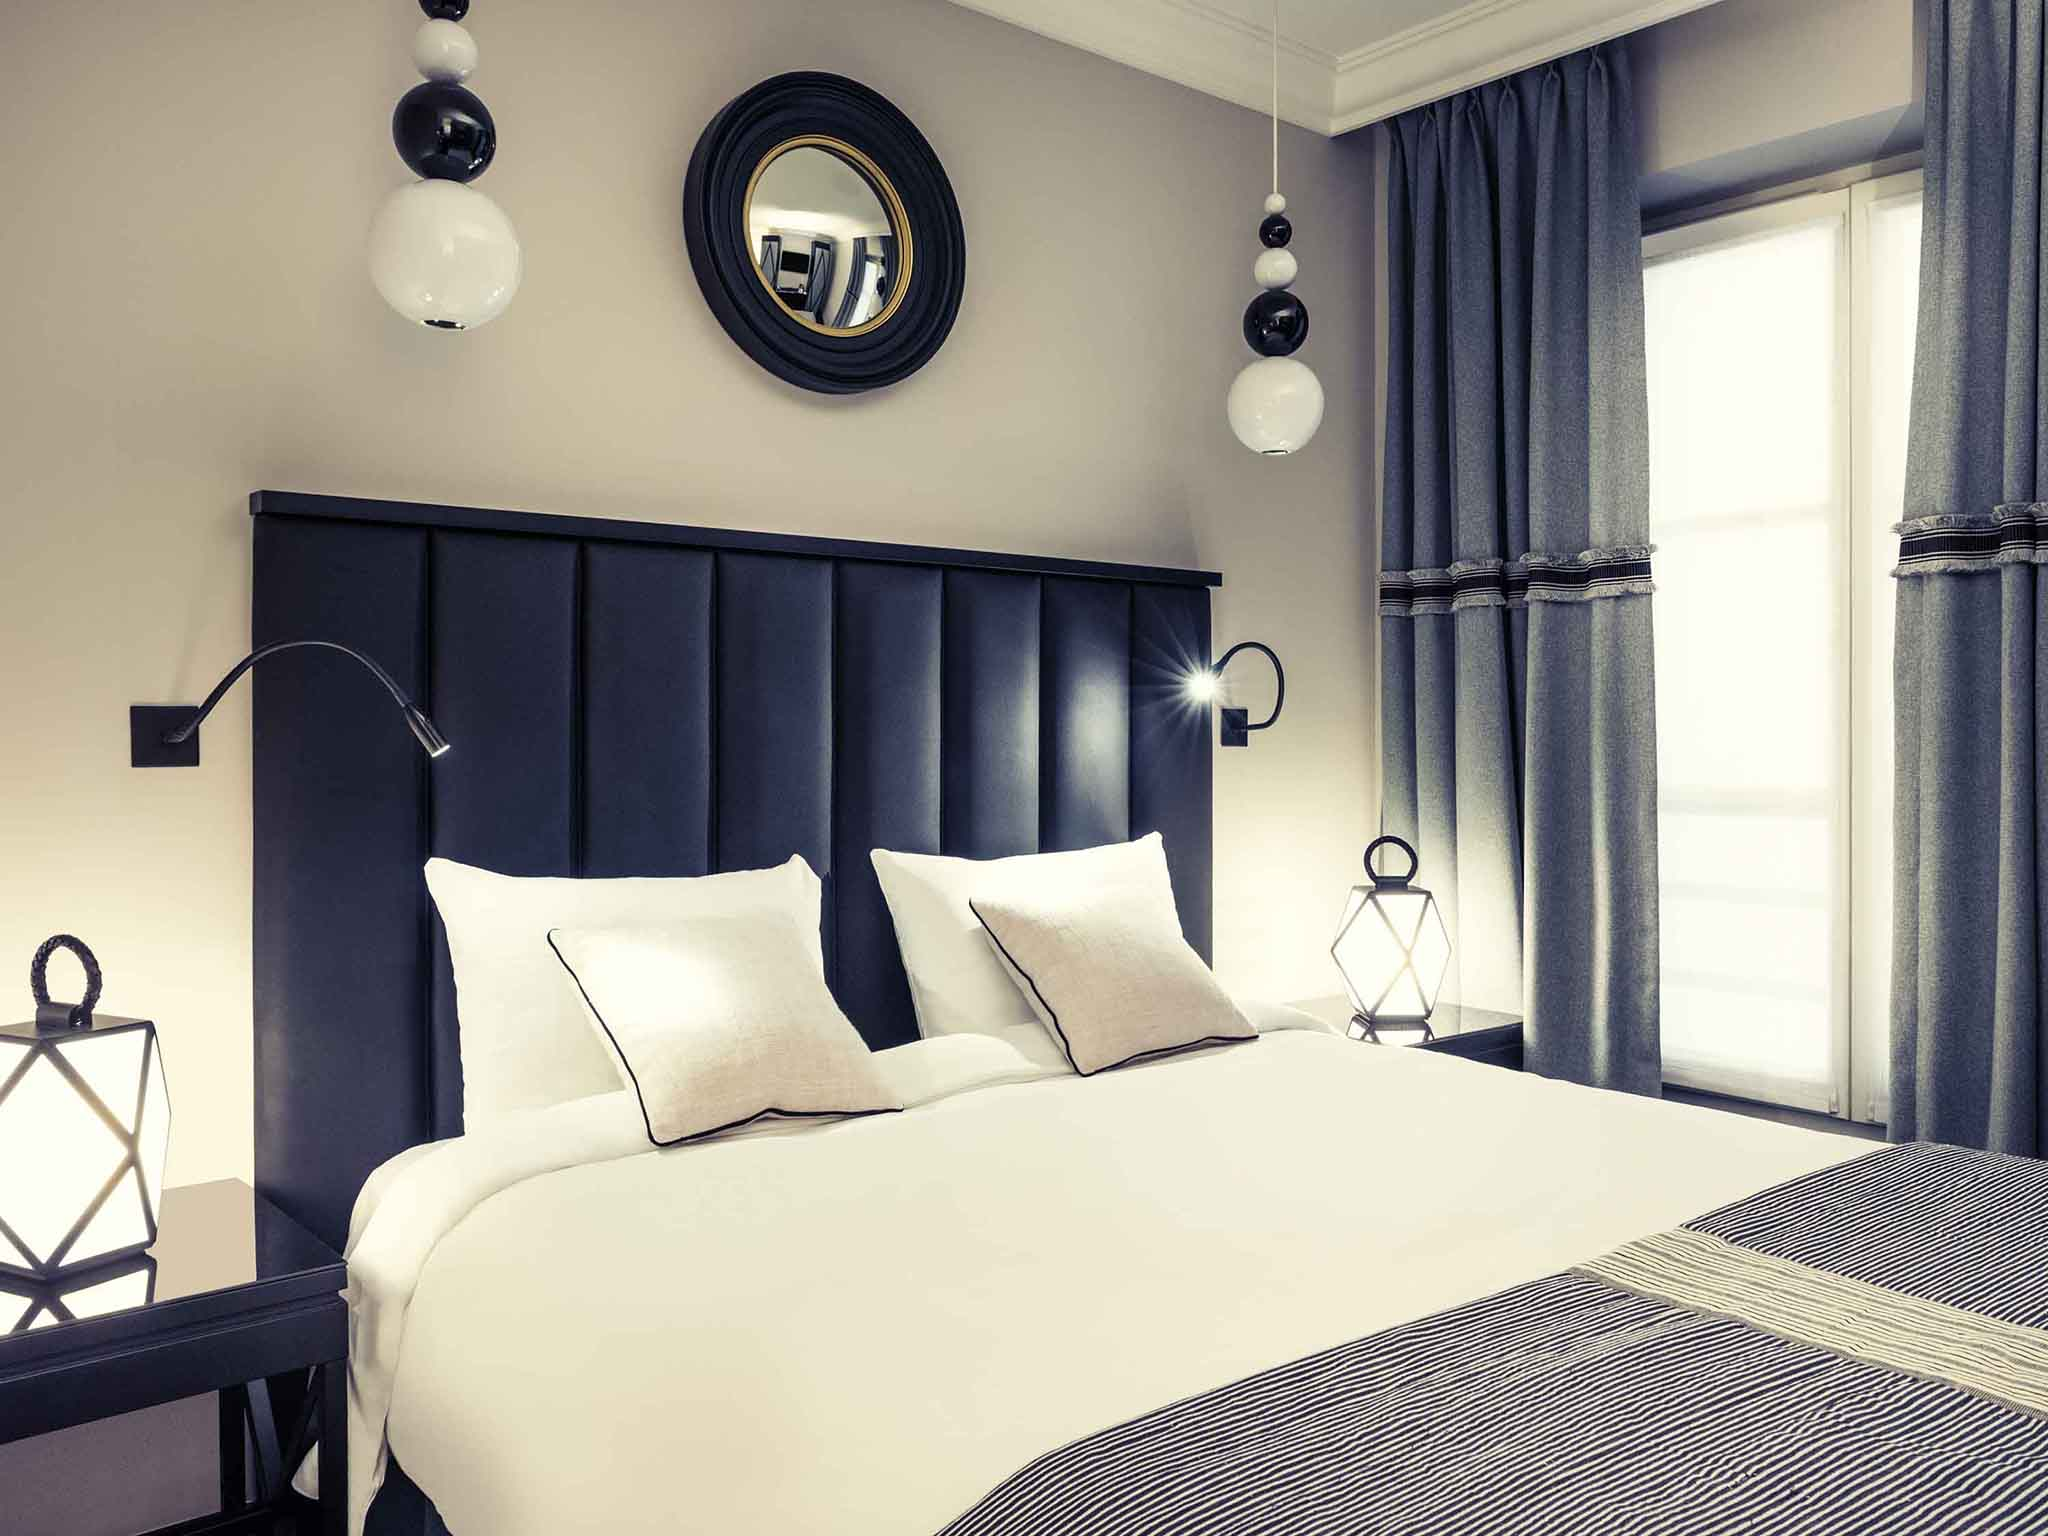 Hotel – Hotel Mercure Paris Arc de Triomphe Wagram